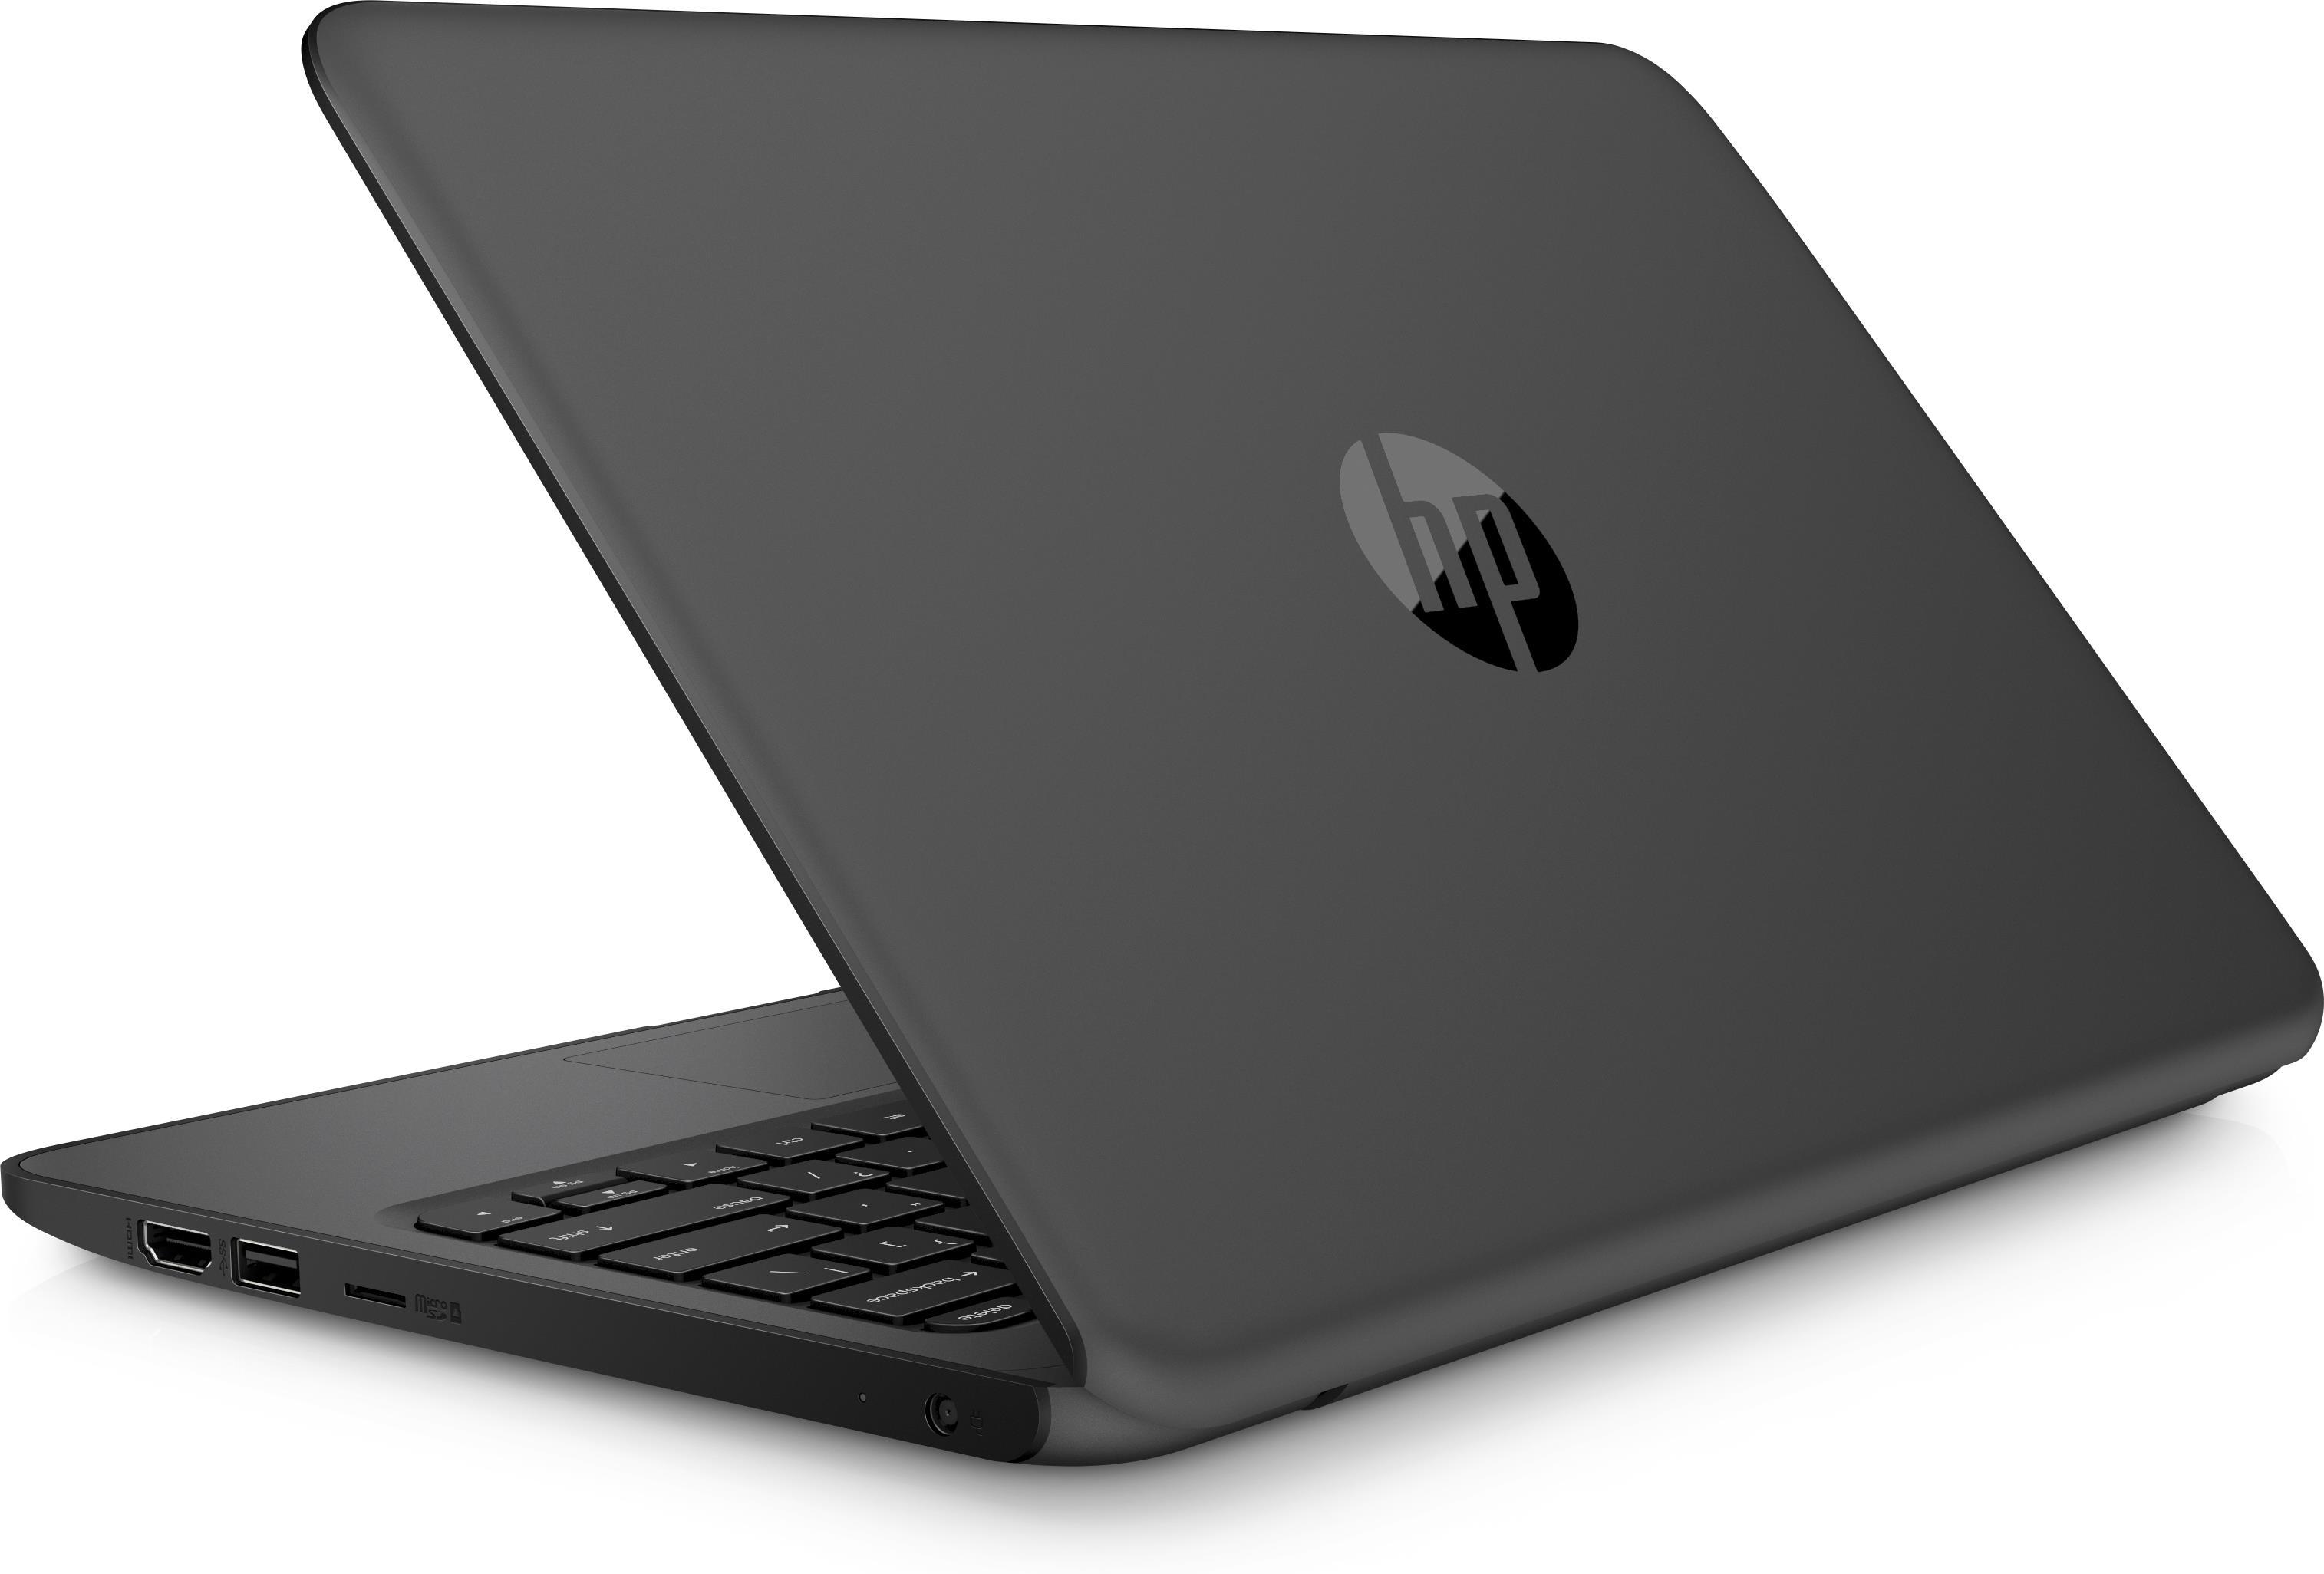 HP Stream 11 Pro G4 EE (11.6 inch) Notebook PC Celeron (N3450) 1.1GHz 4GB 64GB eMMC WLAN BT Windows 10 Pro (HD Graphics 500)